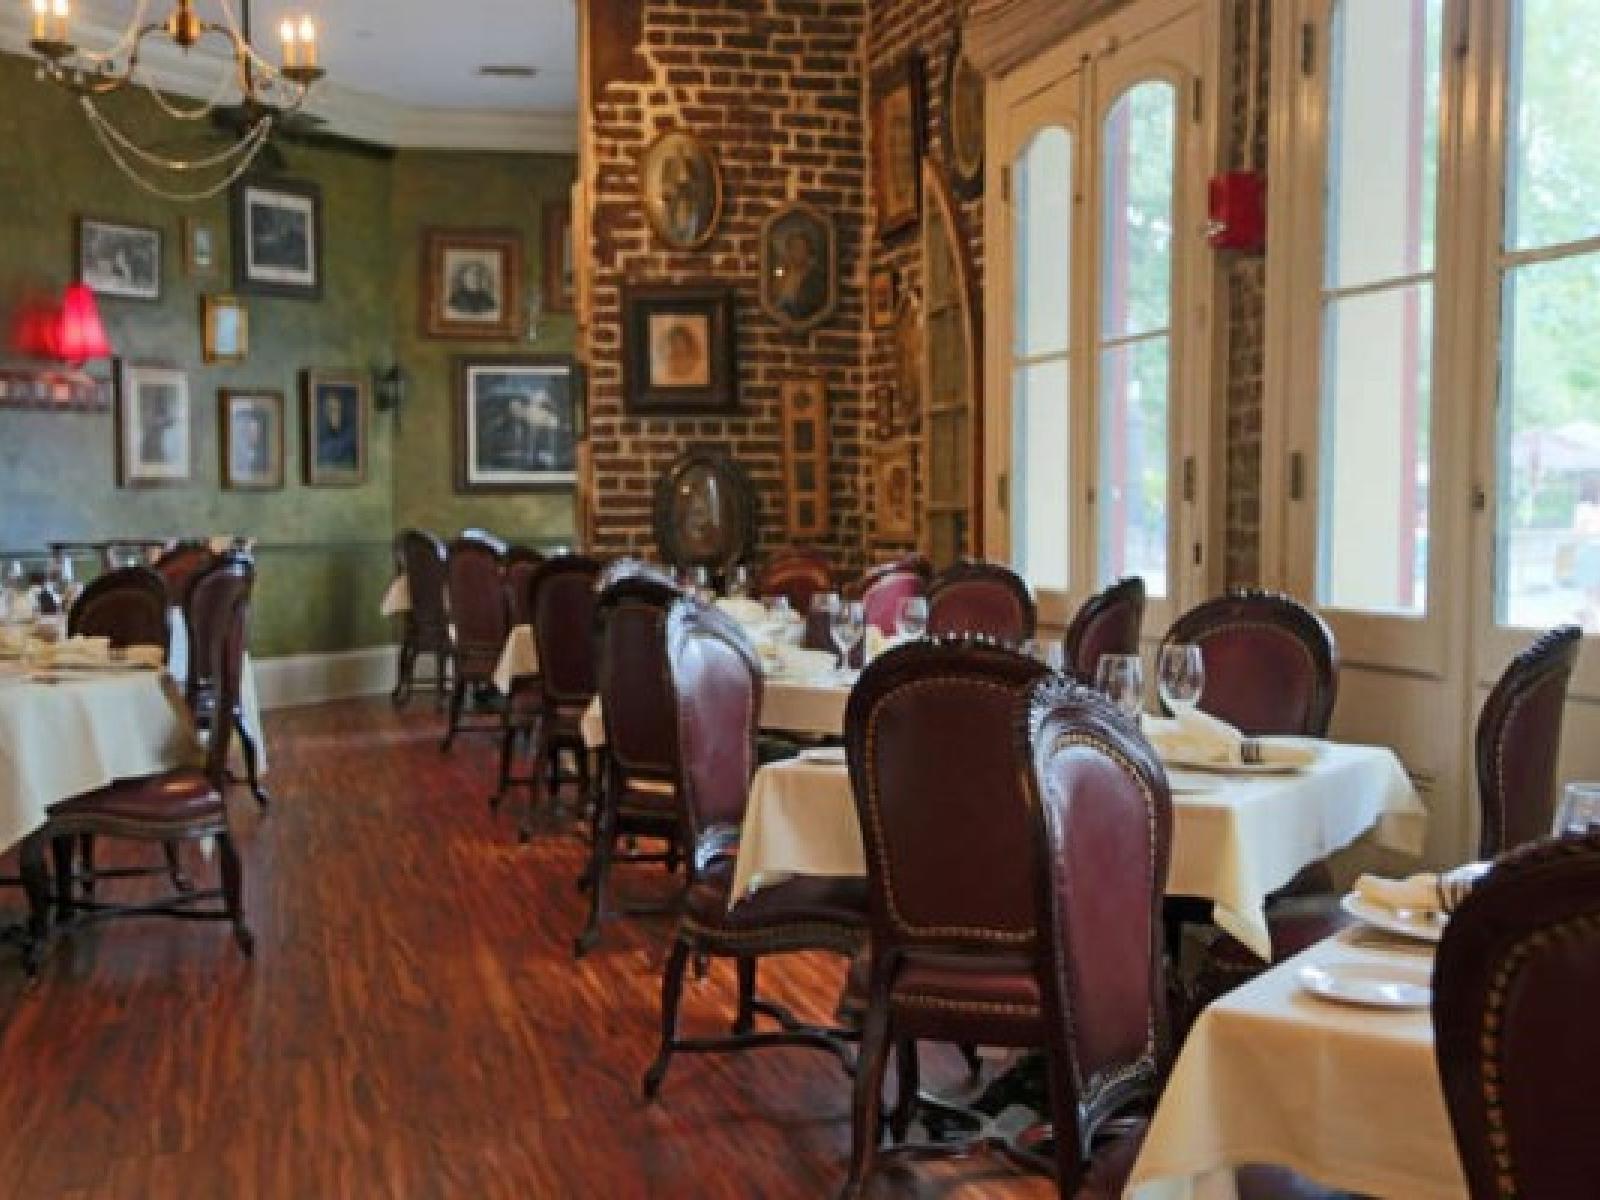 Dining area of Muriel Jackson Square near Andrew Jackson Hotel